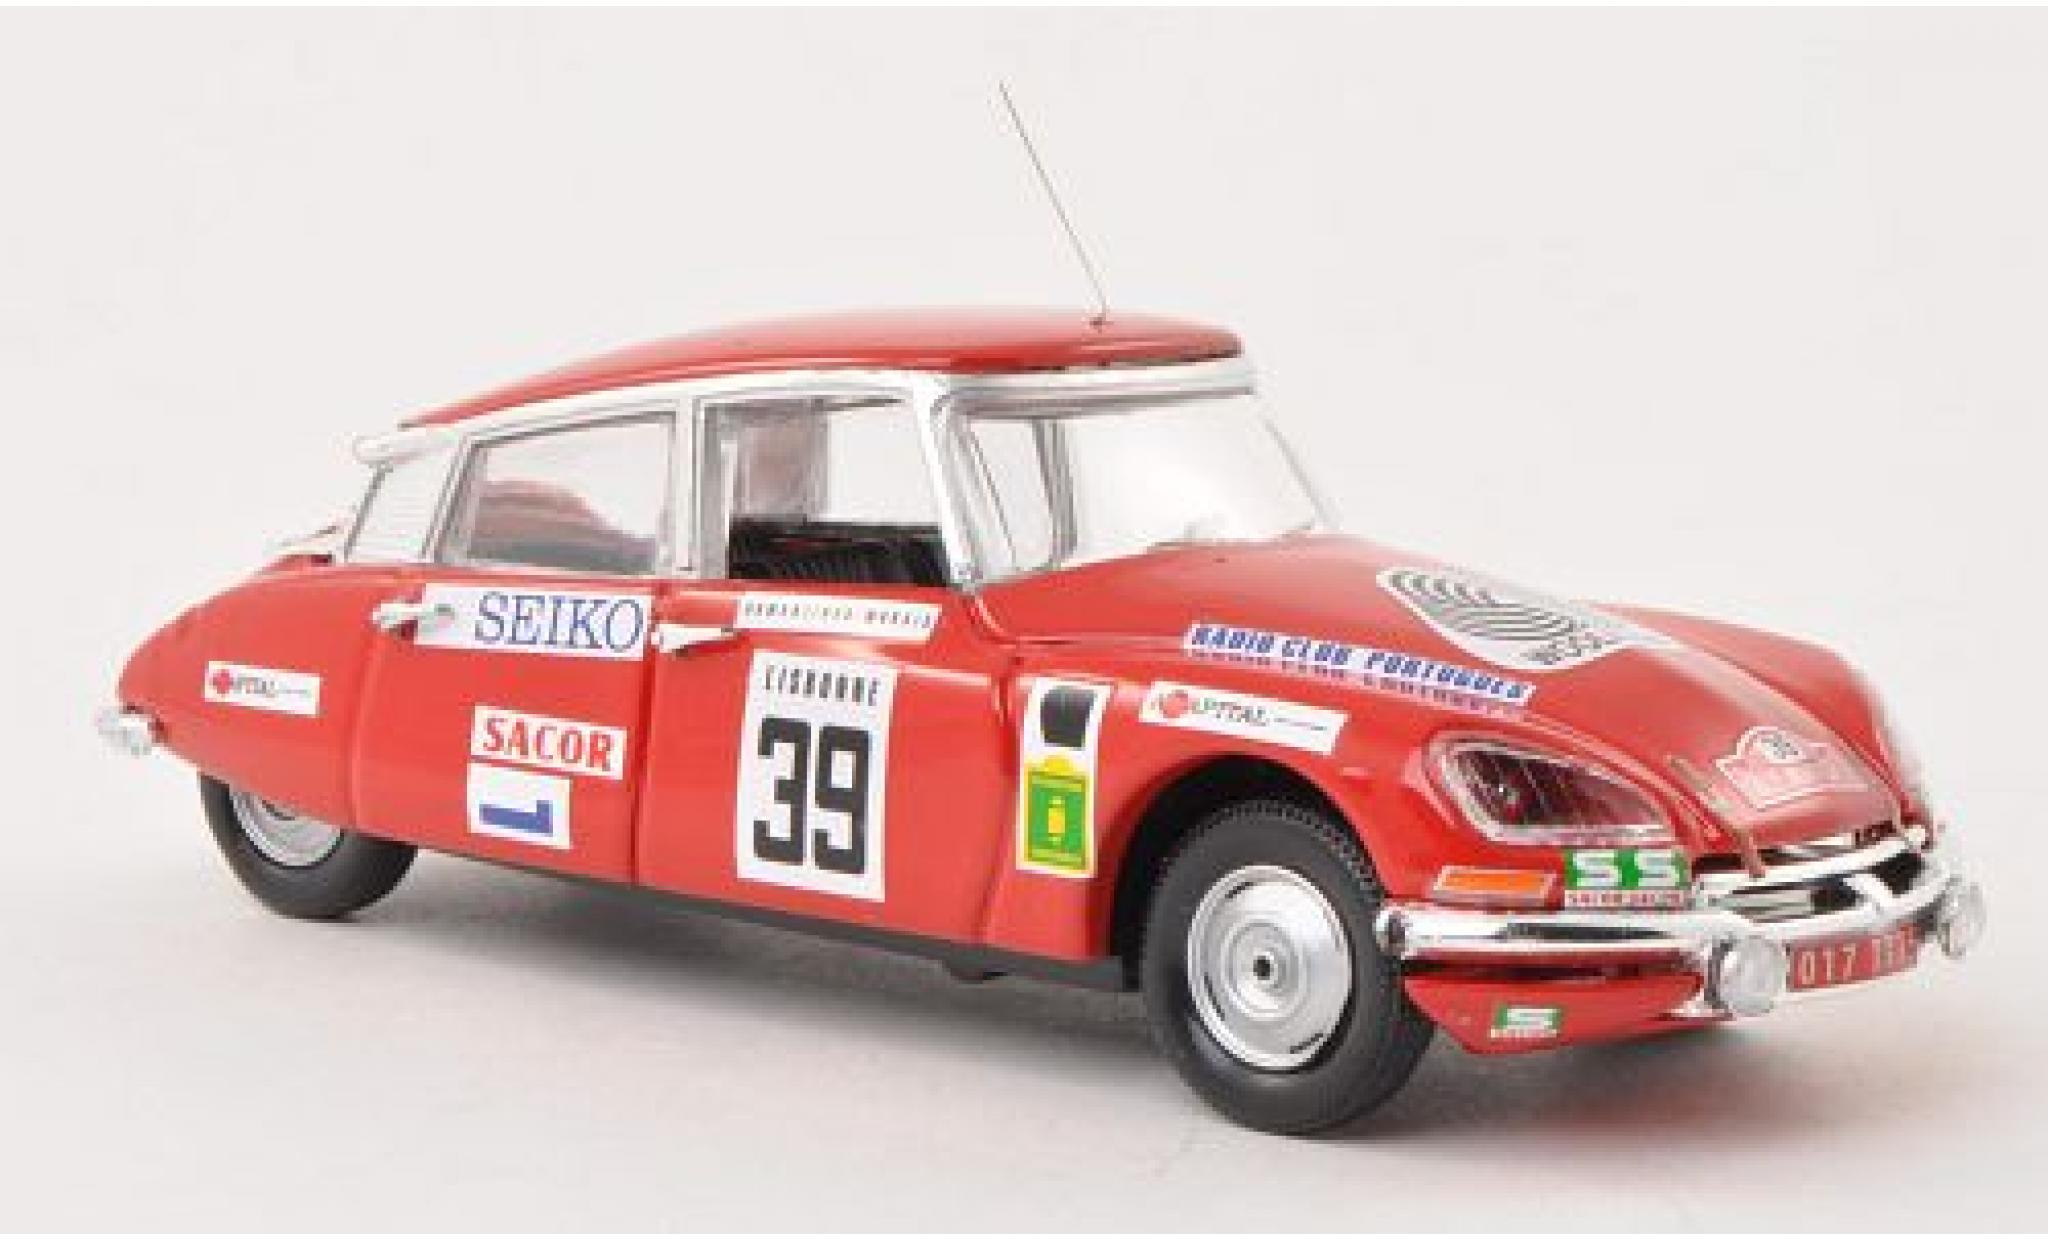 Citroen DS 1/43 Rio 21 No.39 Rallye Monte Carlo 1972 F.Romanzinho/H.de Morais